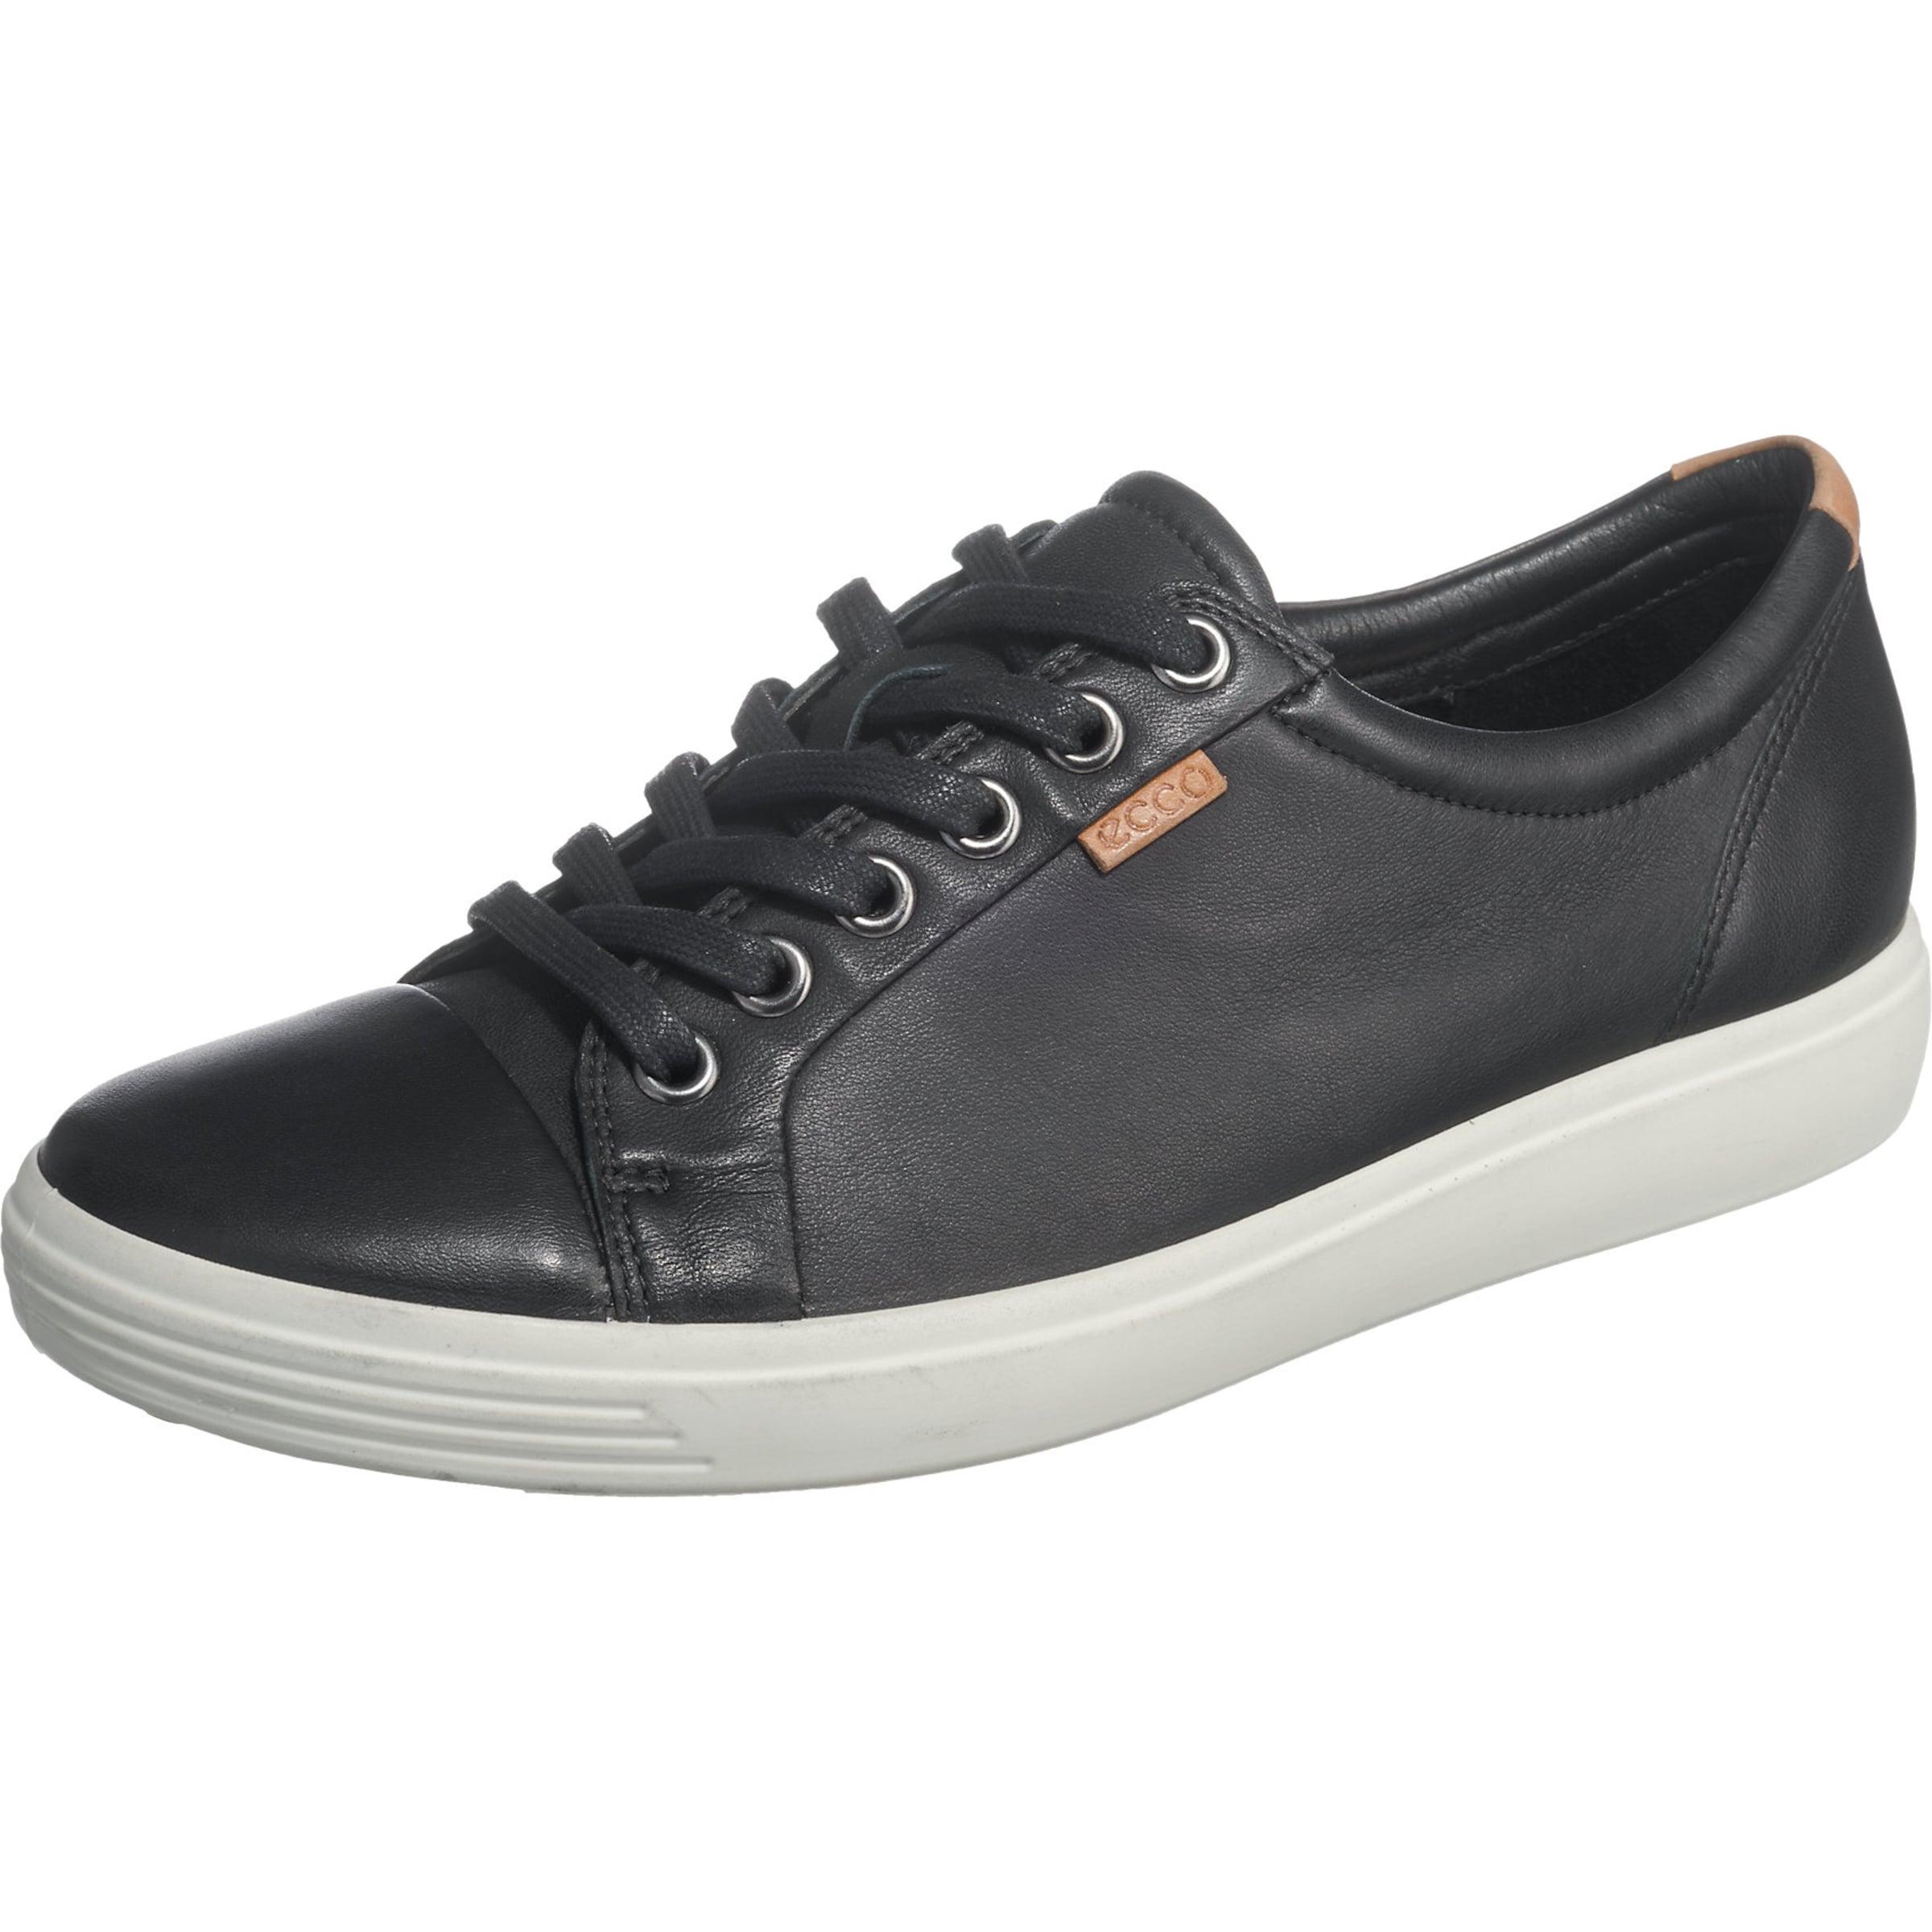 ECCO Sneaker Günstige und langlebige Schuhe